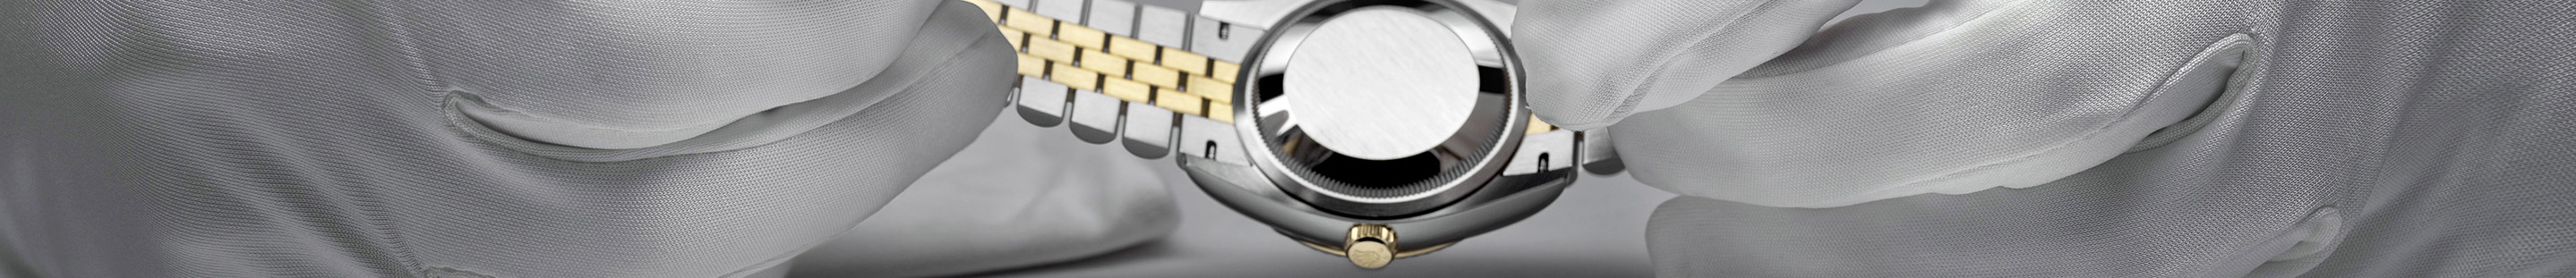 Rolex servicing procedure cover